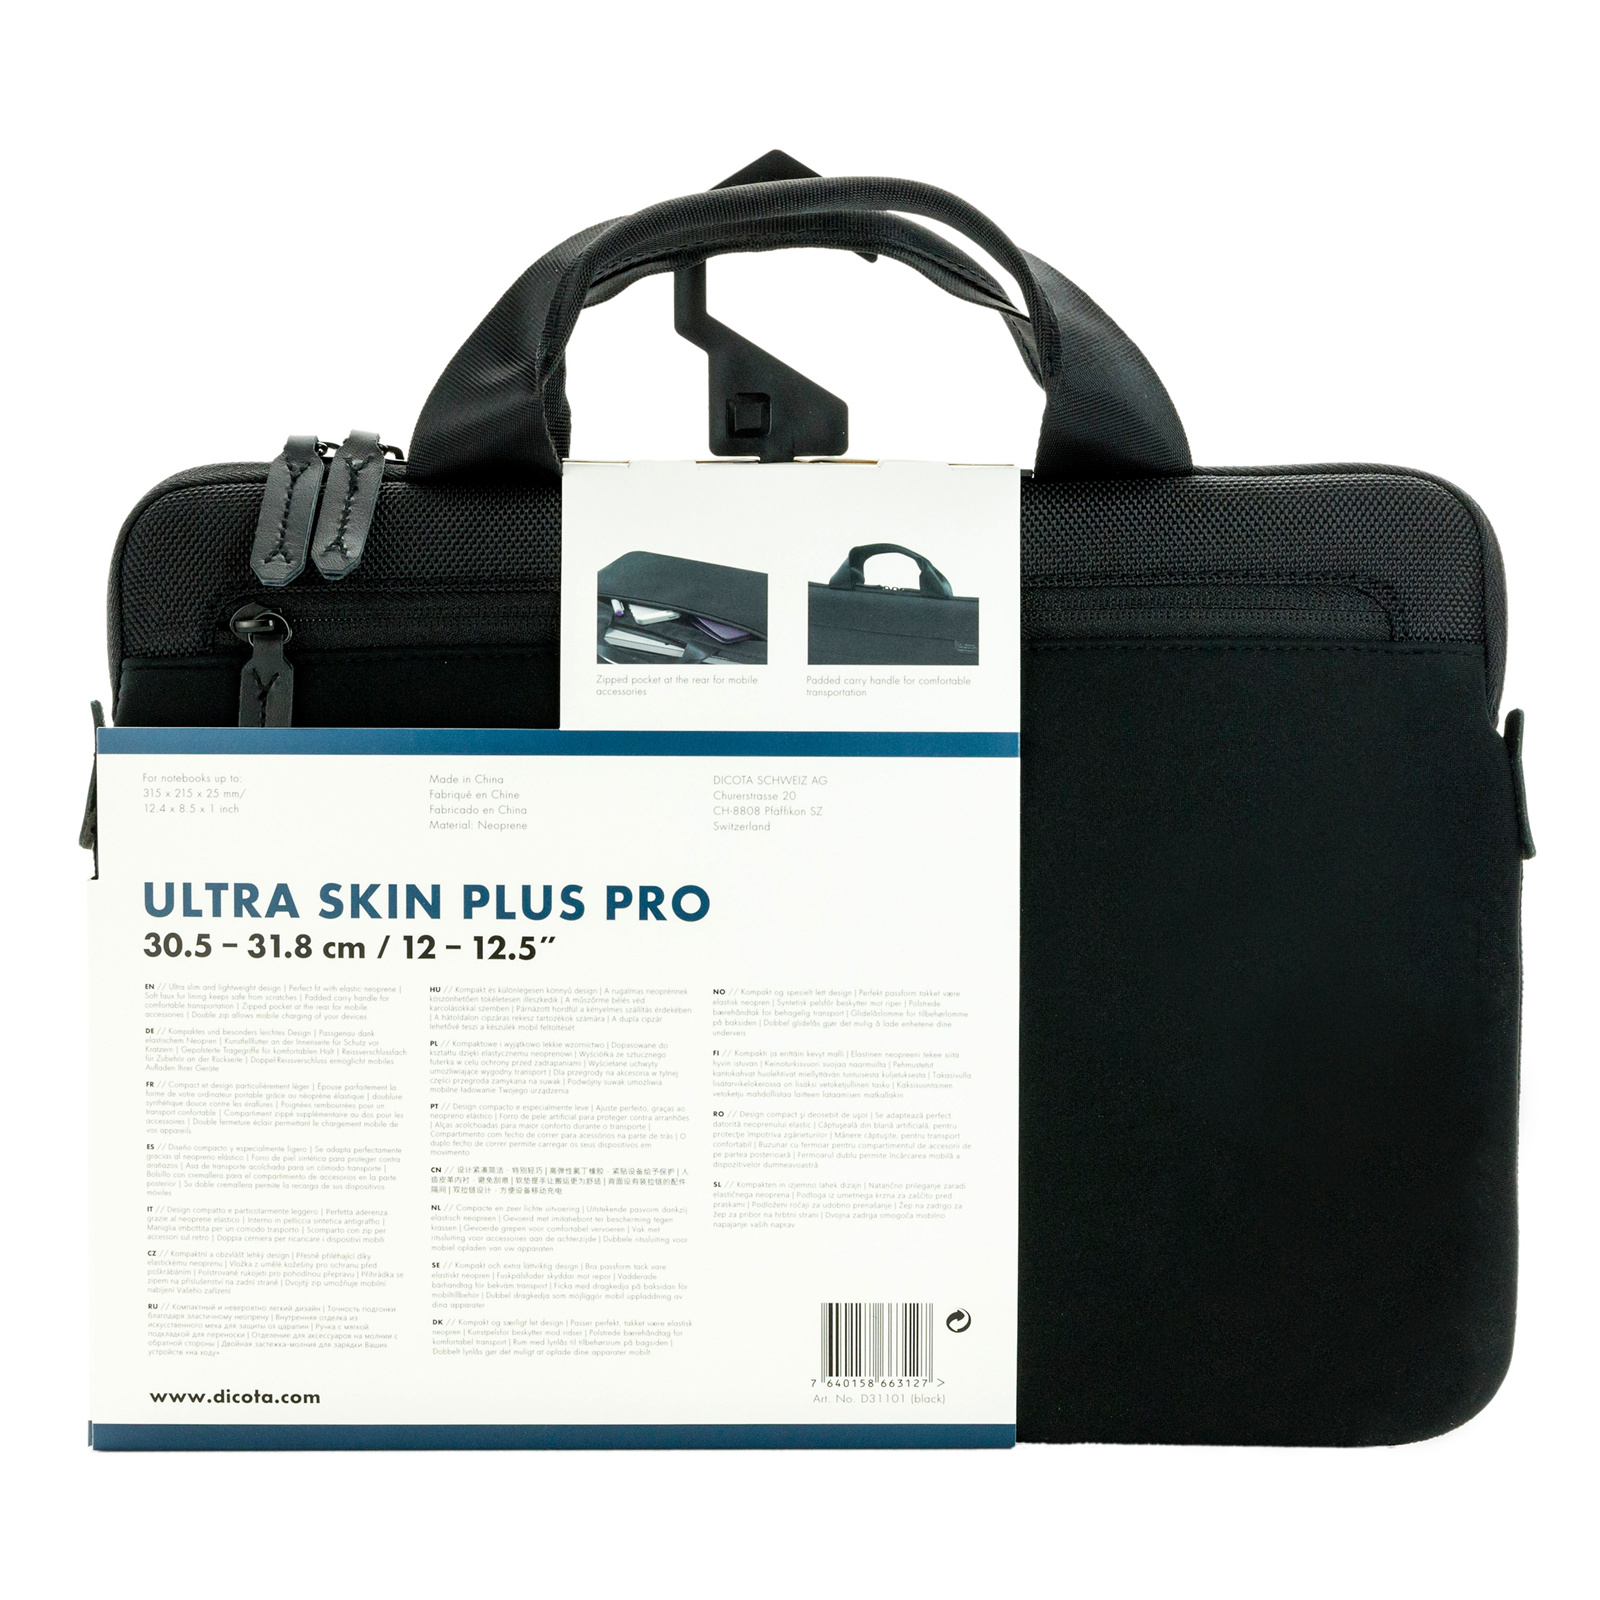 Dicota Ultra Skin Plus PRO Carry Bag   Case for 12